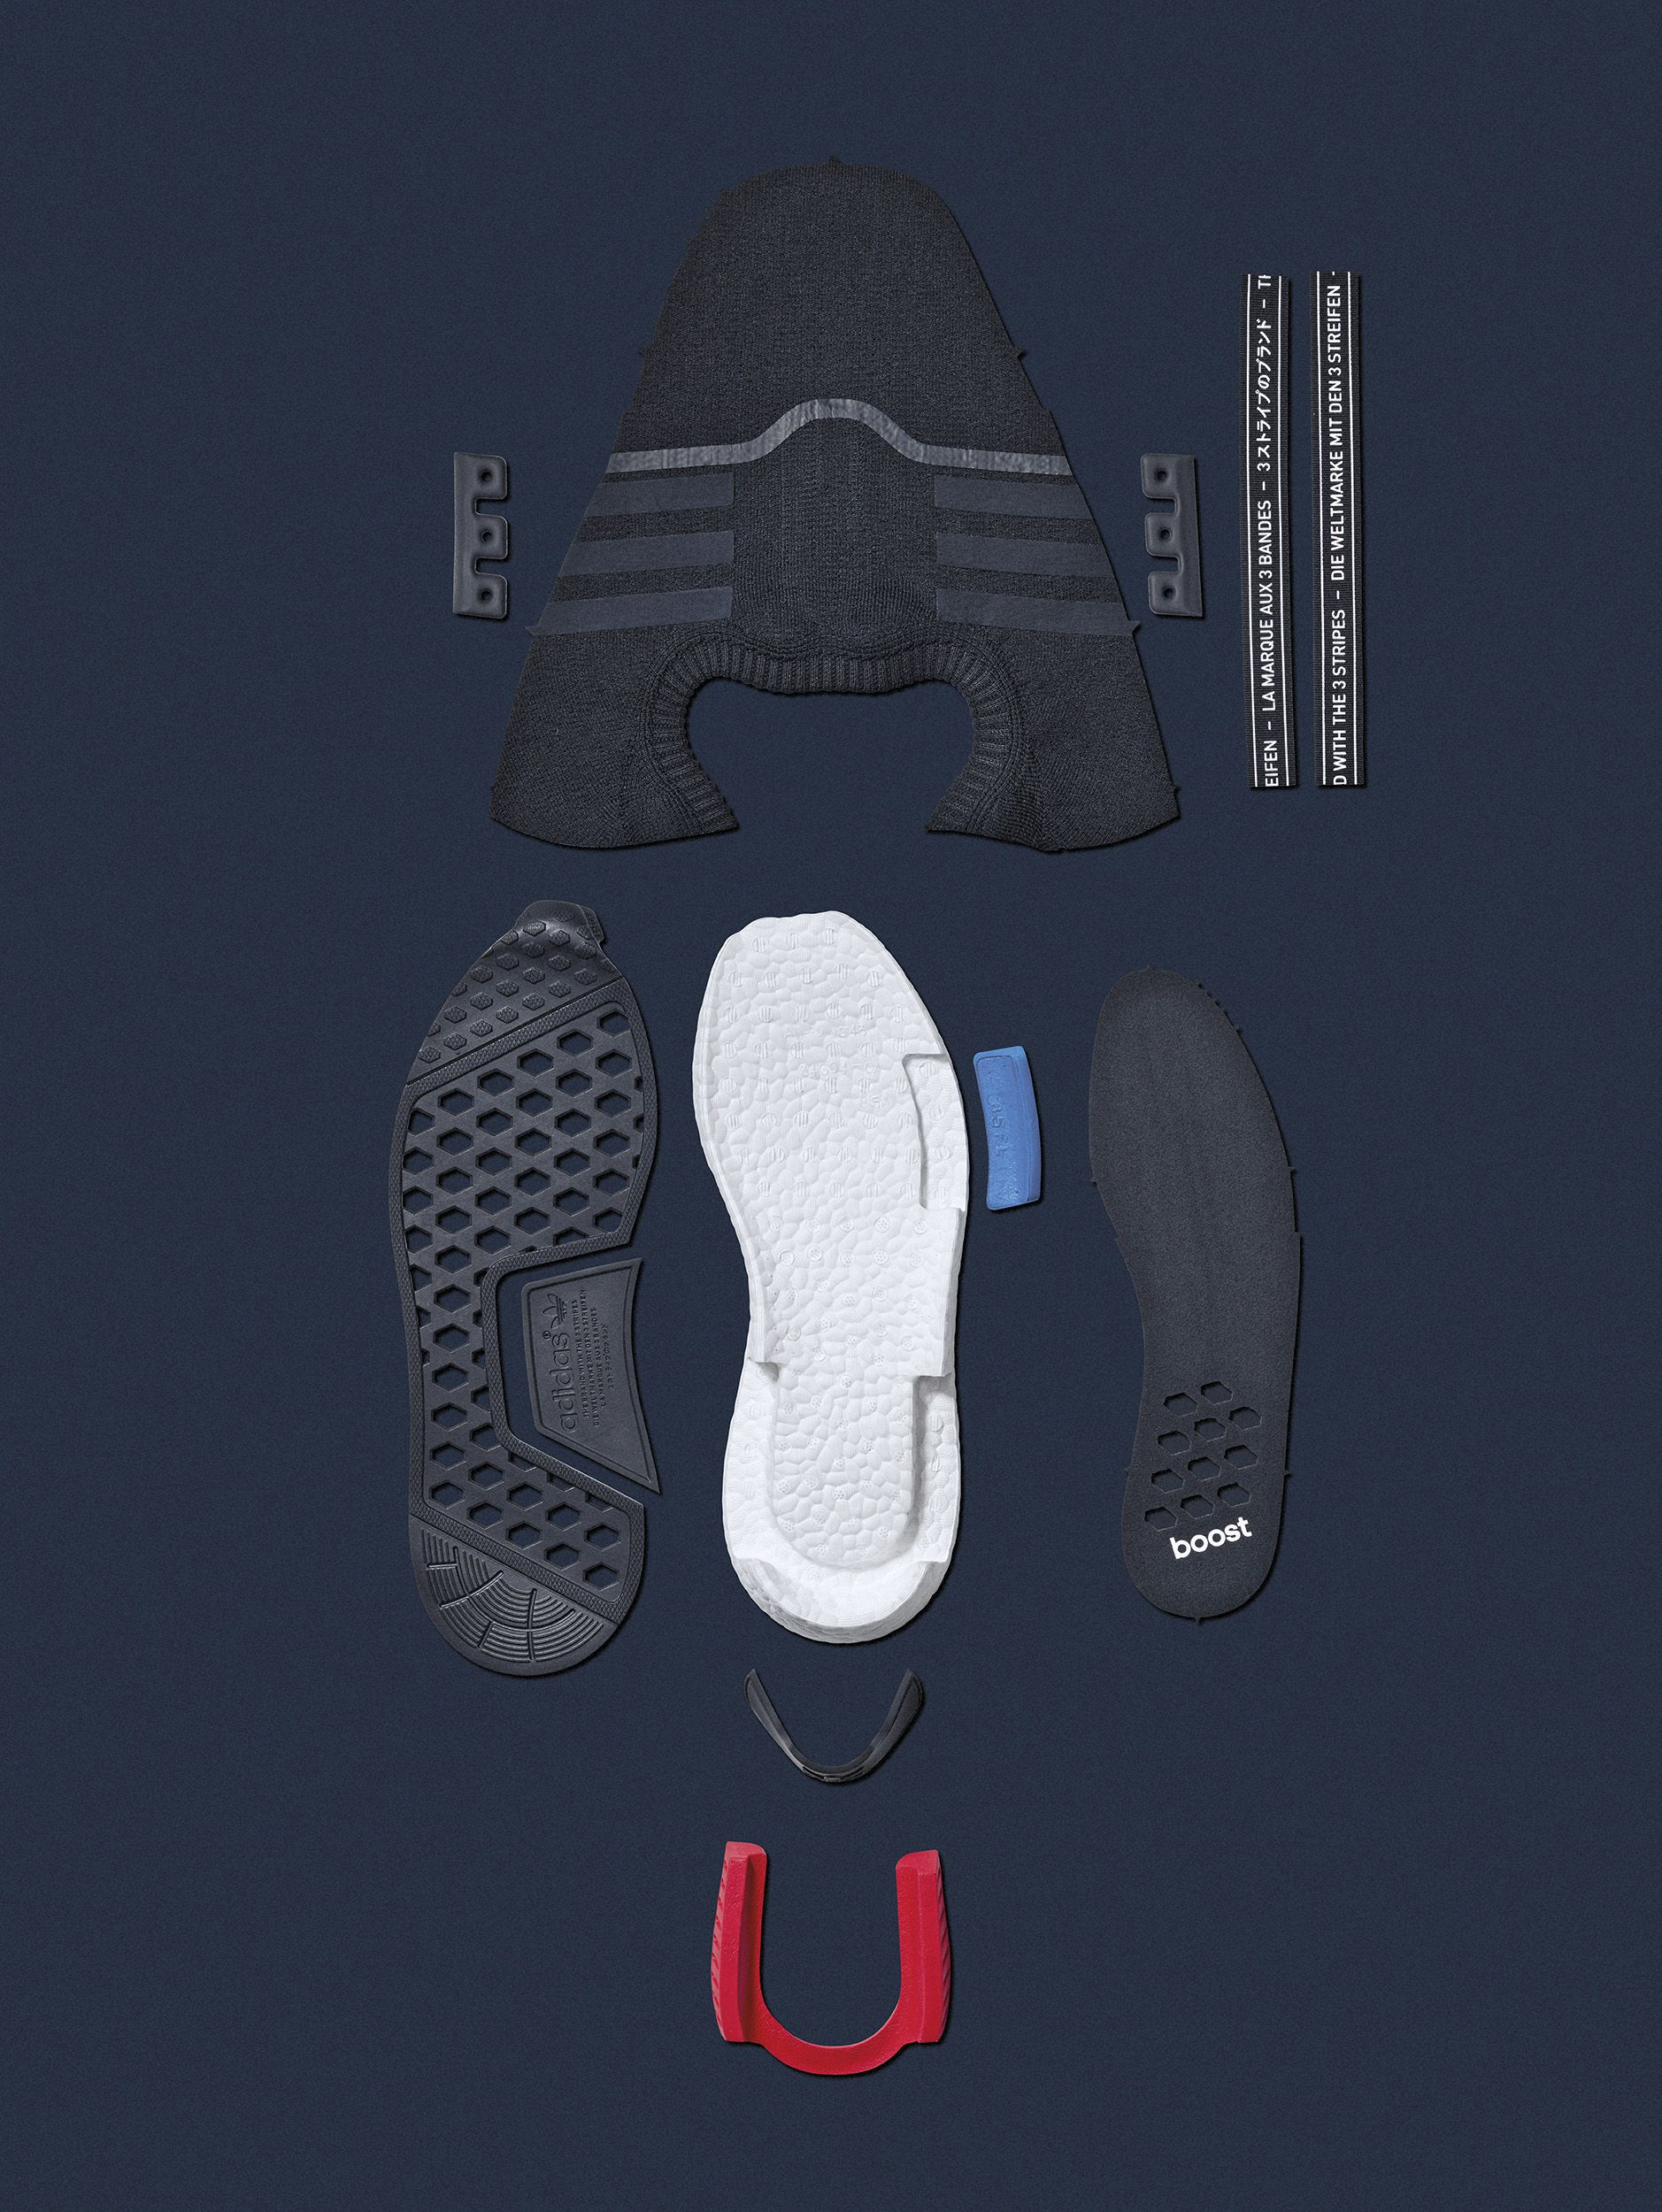 82fcba6446cb3 Meet the Mastermind Behind Adidas  Biggest Sneakers